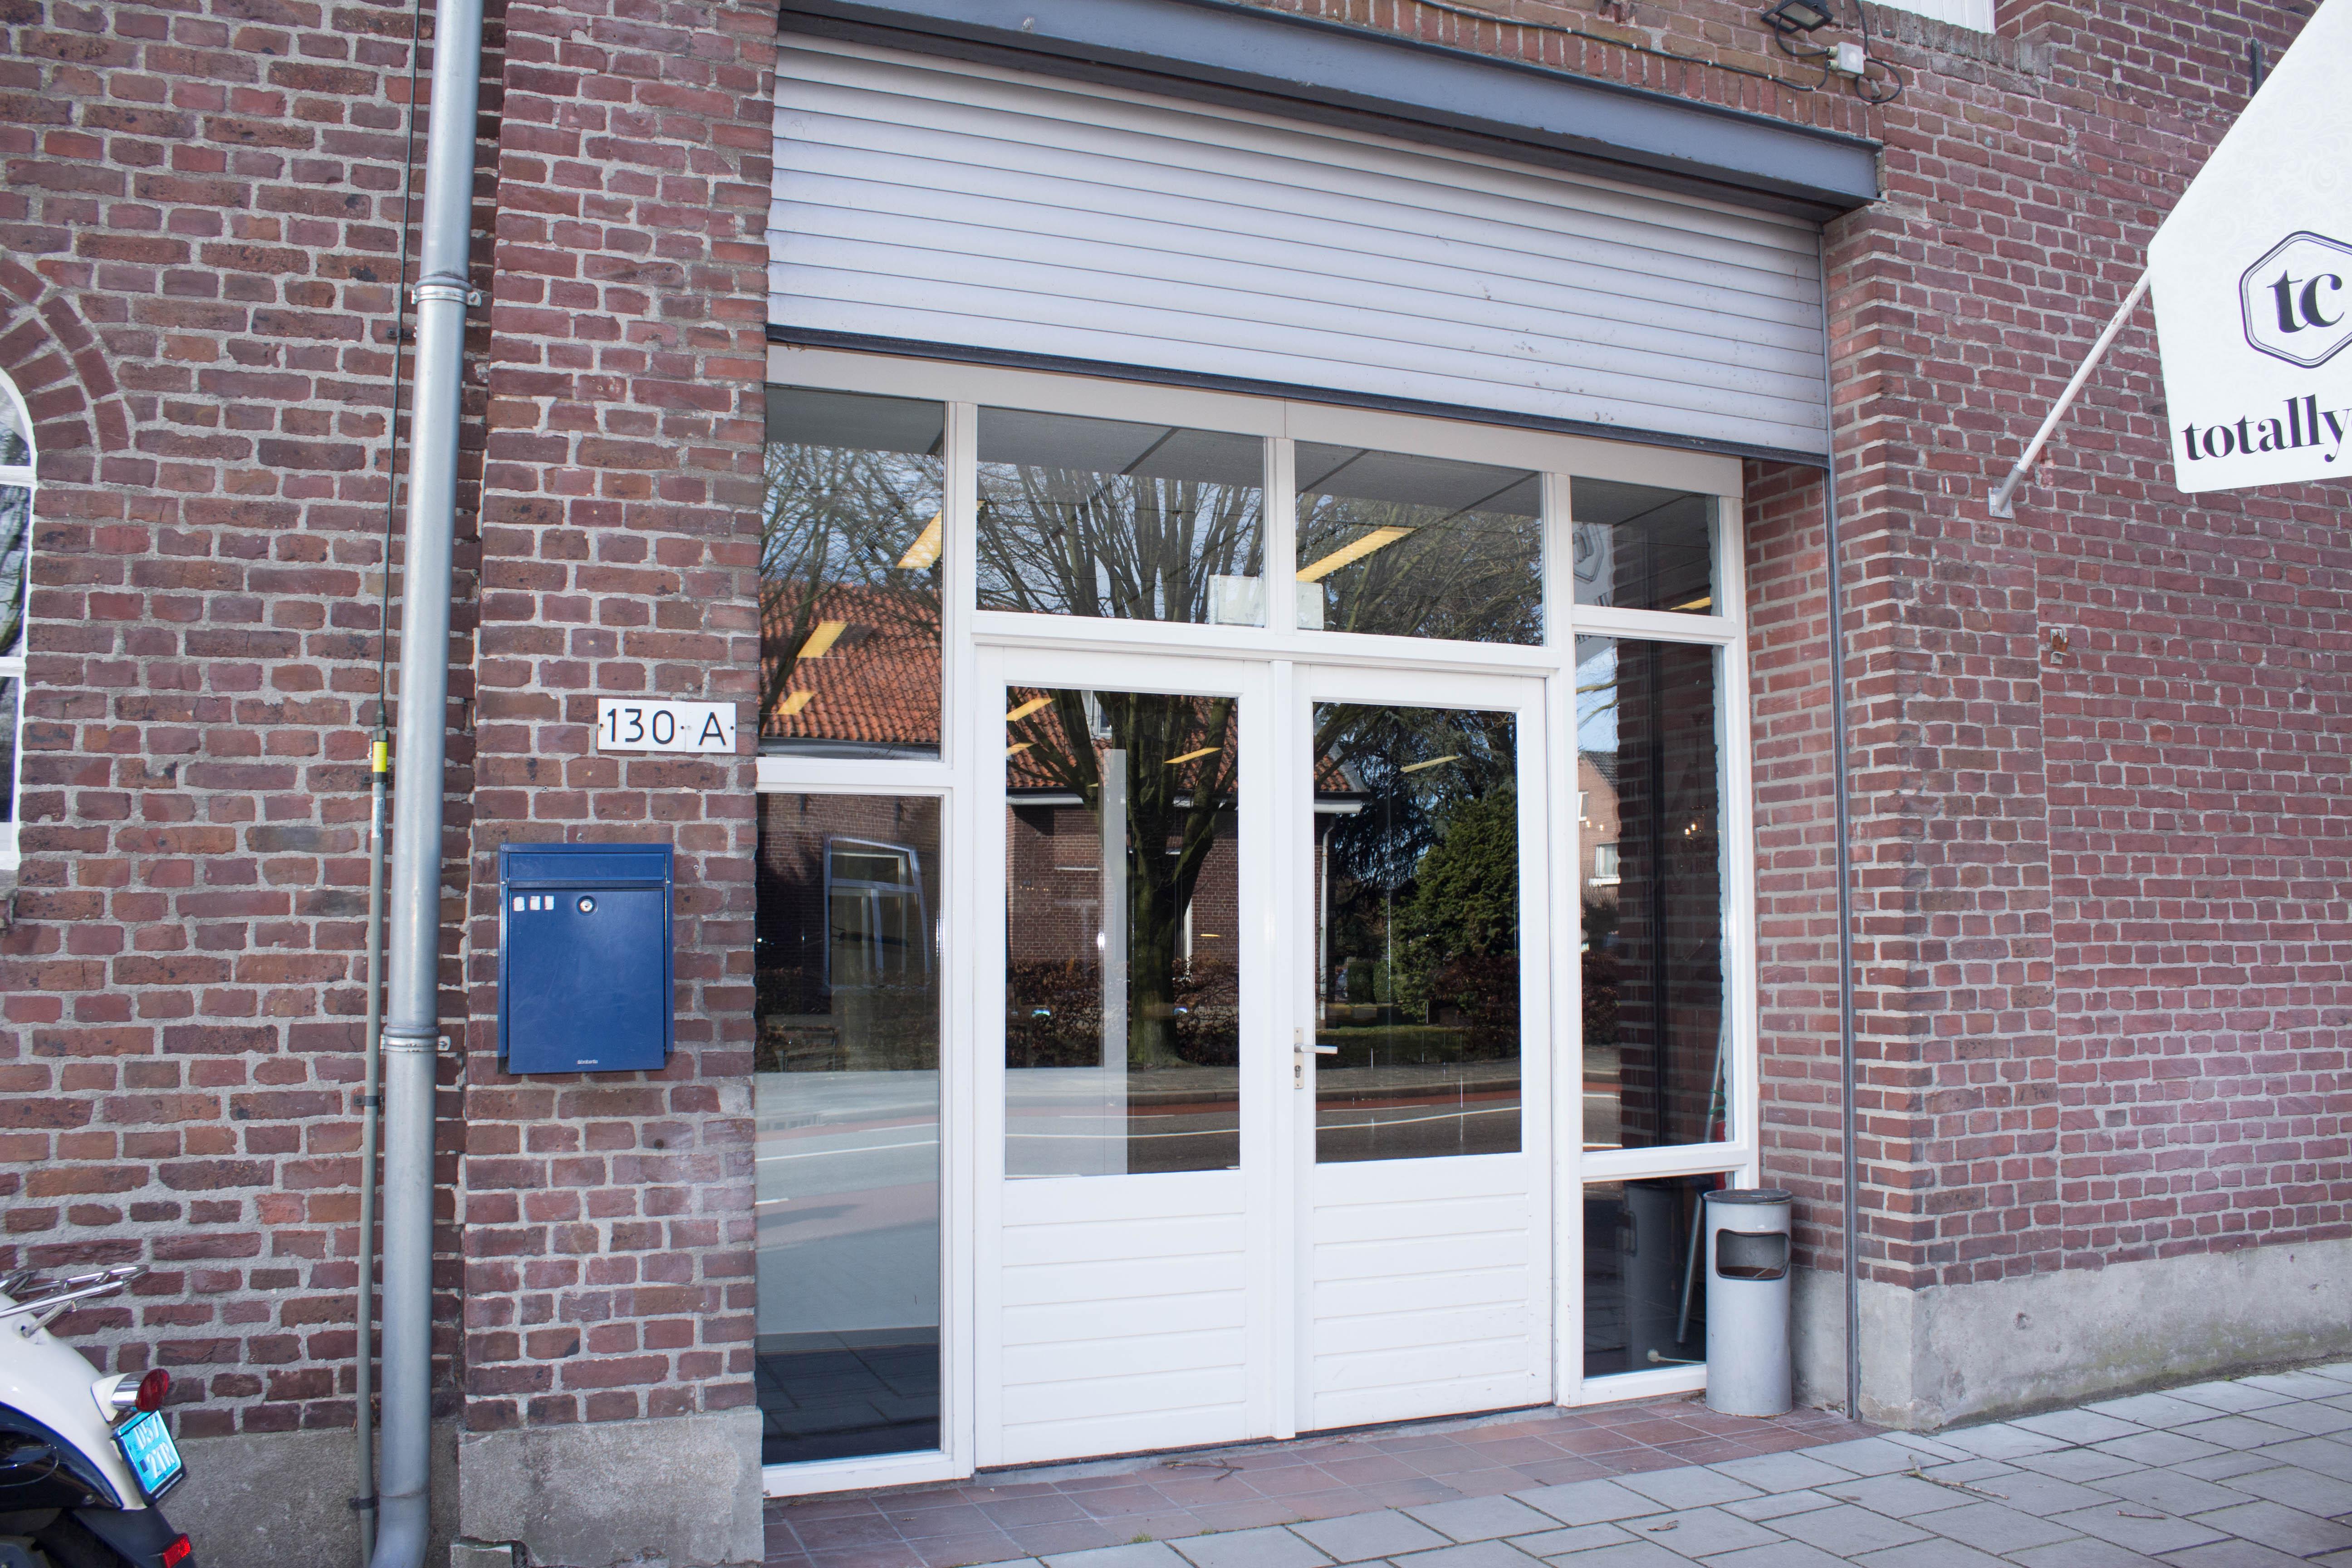 2. Stationsweg 130a